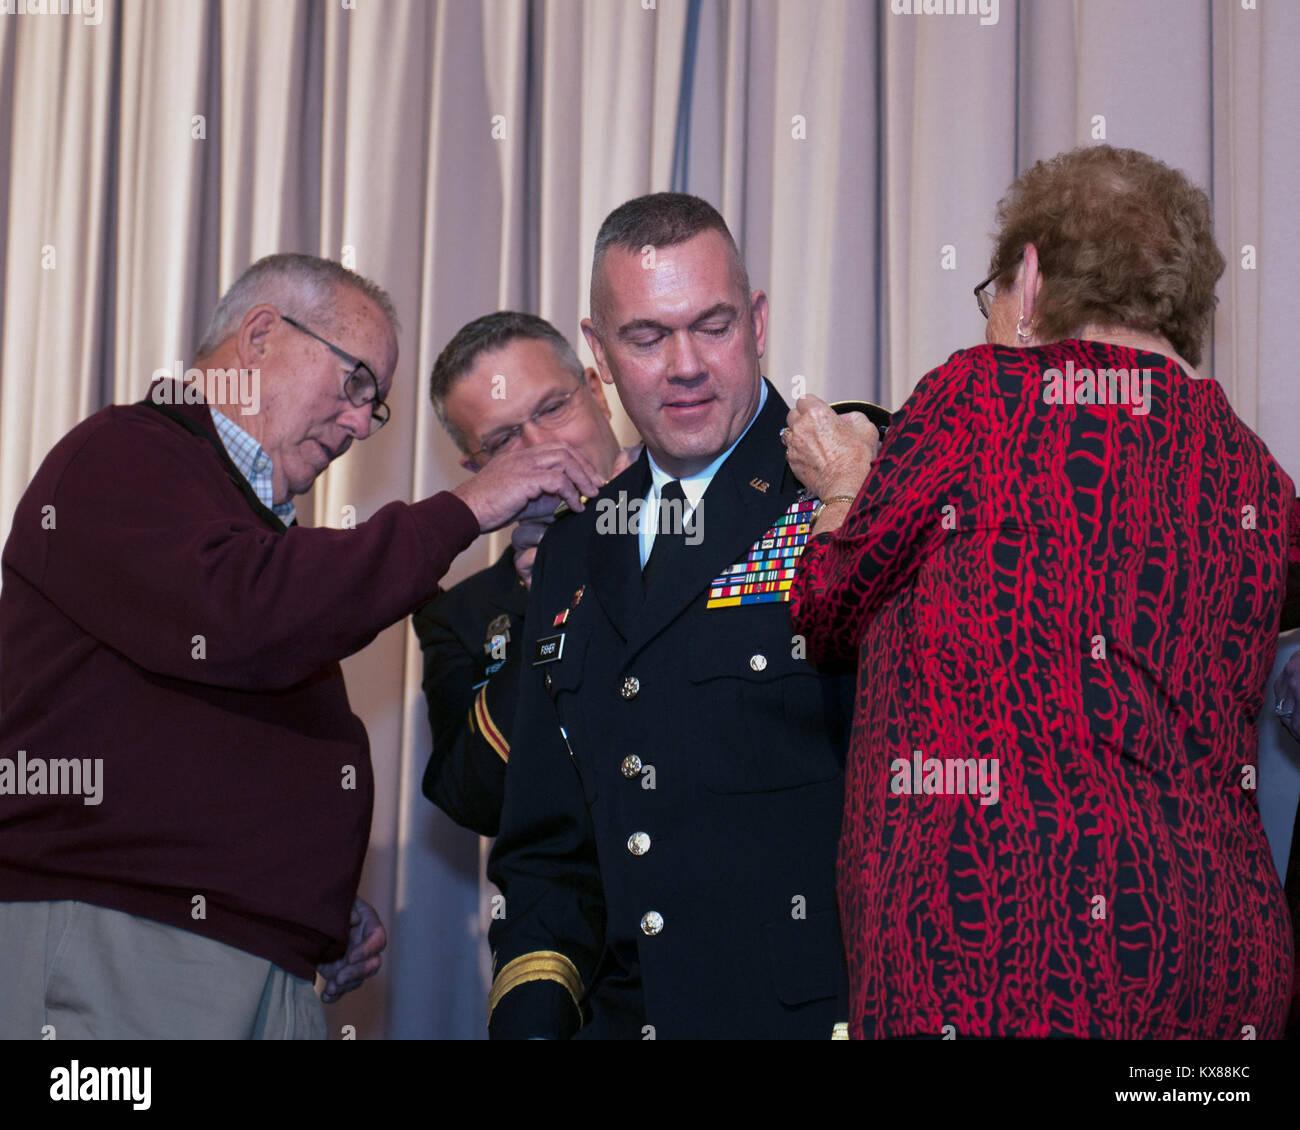 Brig. Gen. Thomas Fisher promotion ceremony 11-5-16 - Stock Image